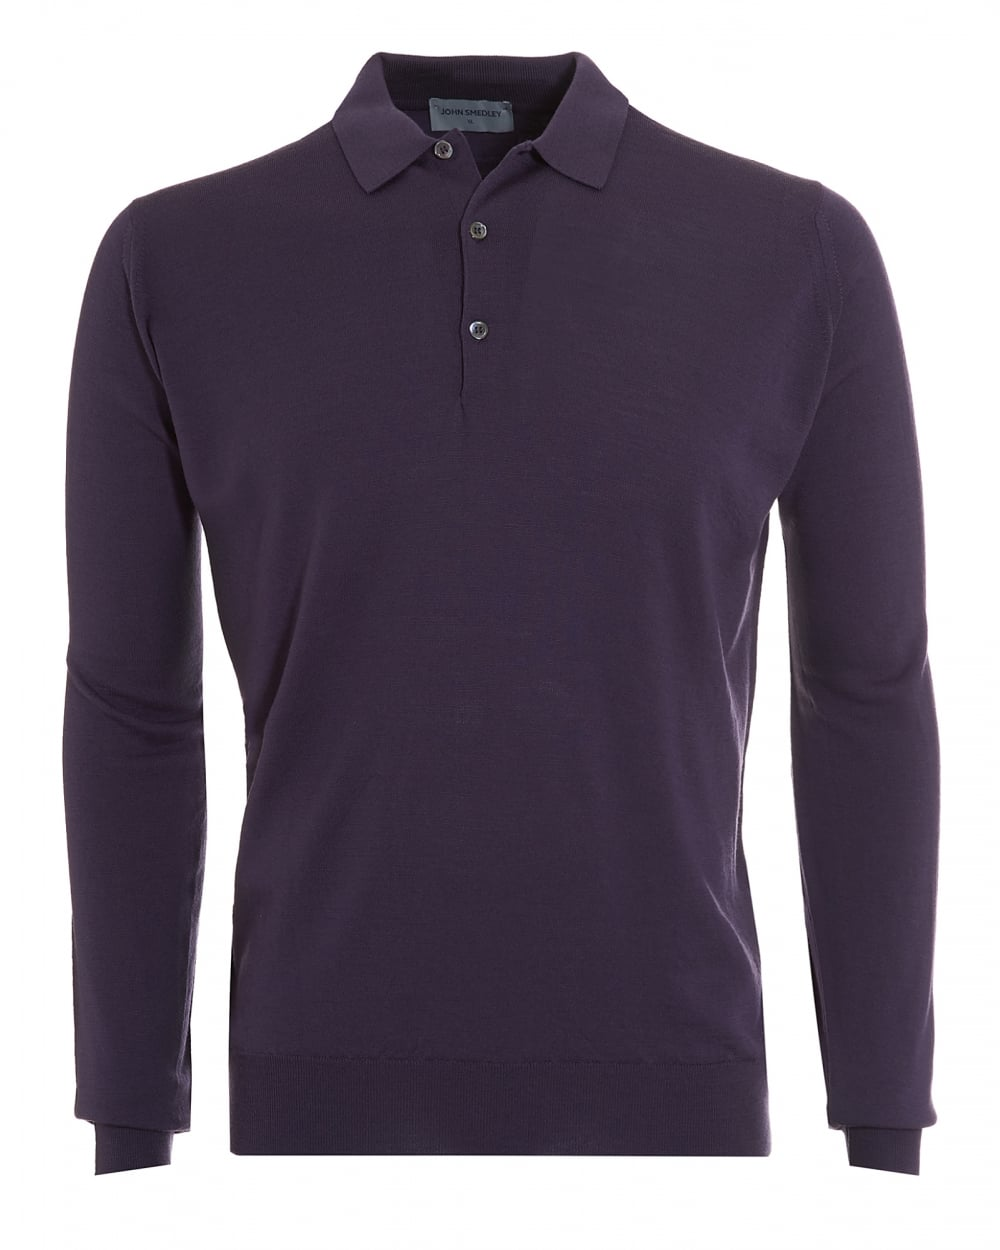 John smedley mens polo tyburn long sleeved purple polo shirt for Long sleeve purple polo shirt